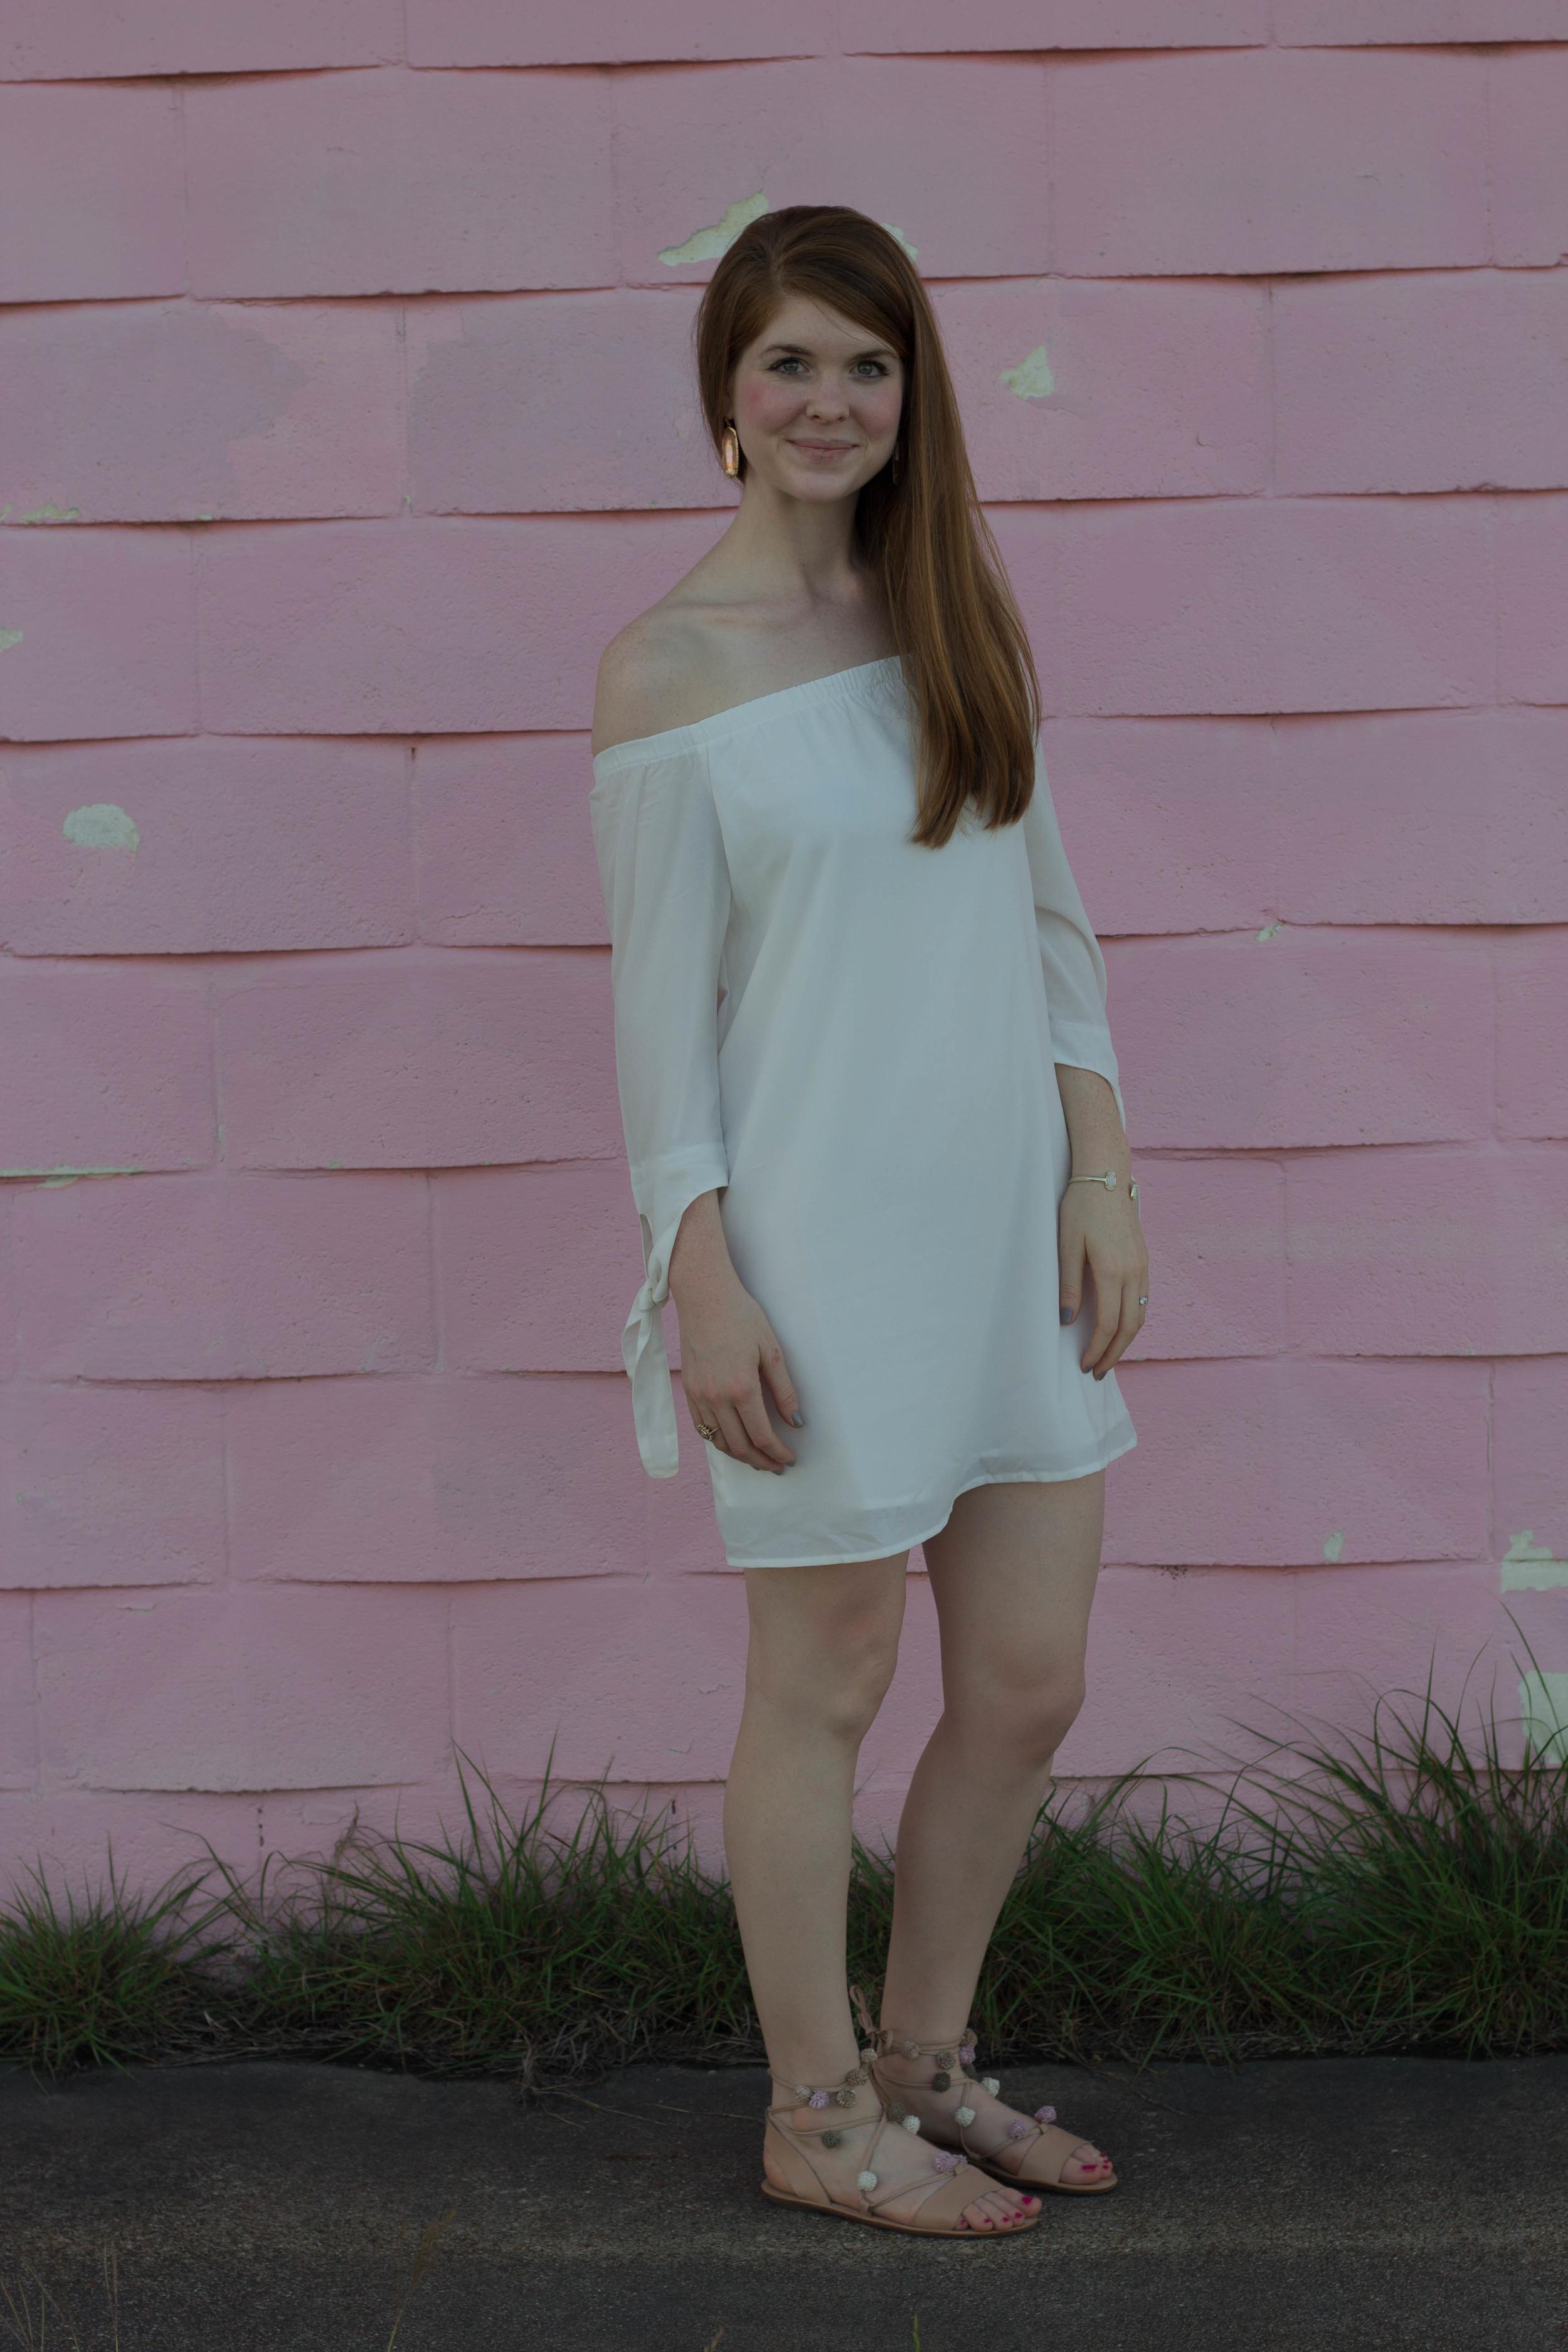 Miss Genial Off Shoulder Dress, Tobi, Off the shoulder white dress, pom pom lace up sandals, loeffler randall, kendra scott lauren earrings